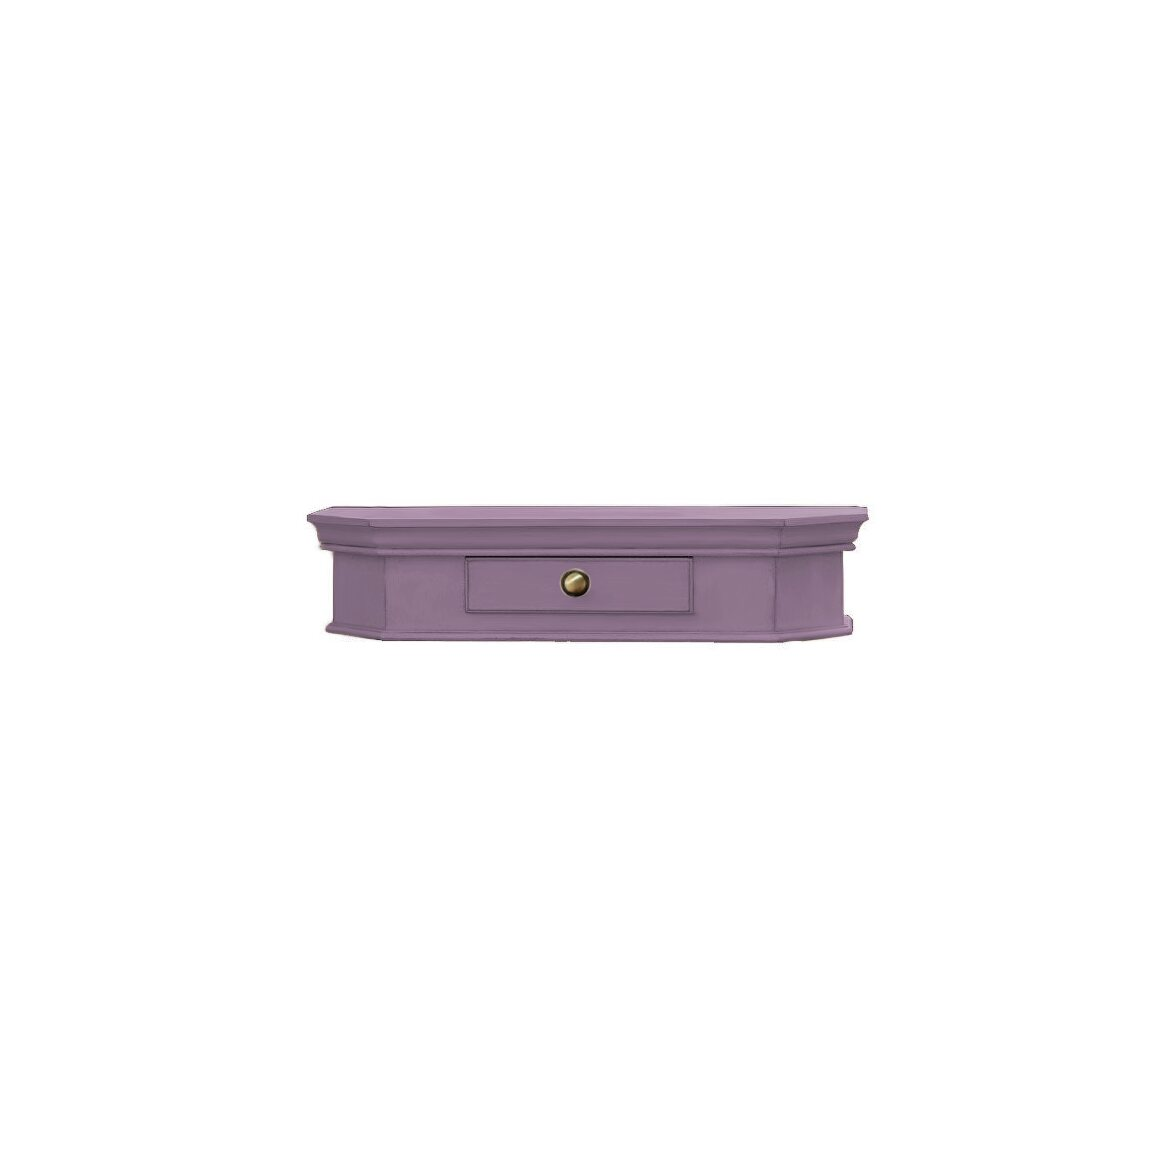 Подвесной ящик Leontina, лавандового цвета | Консоли Kingsby